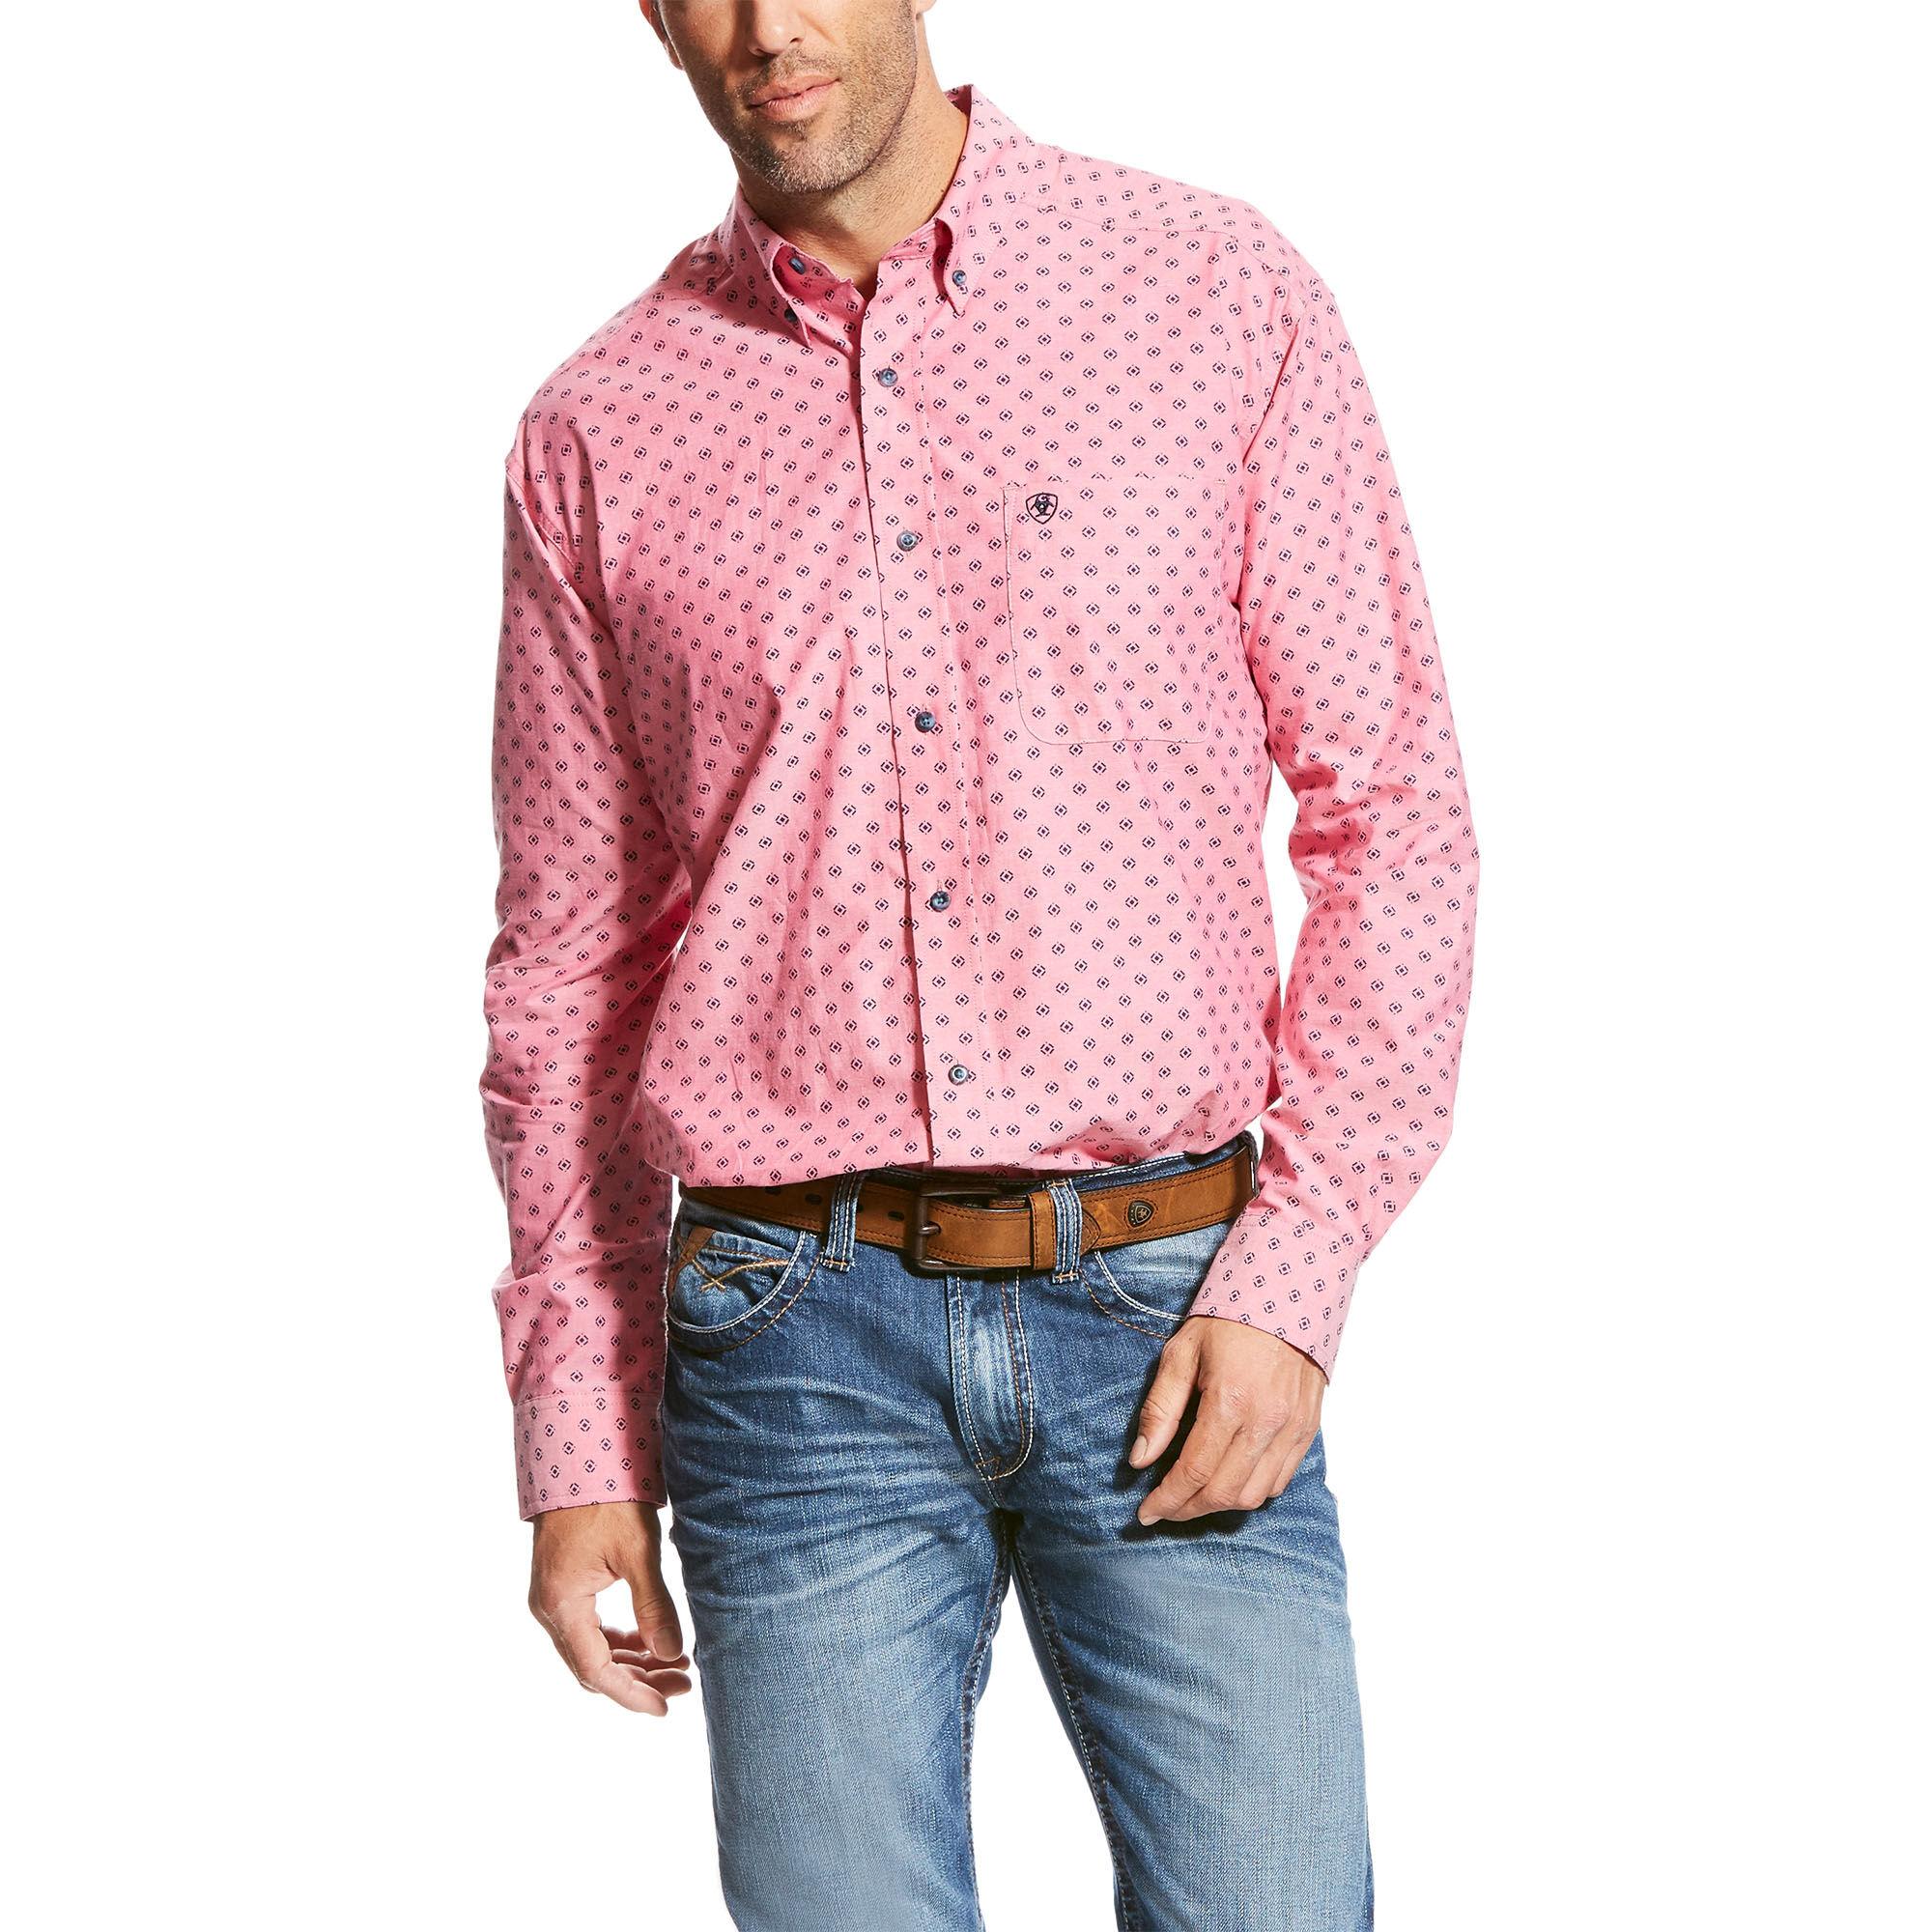 Tanberg Shirt